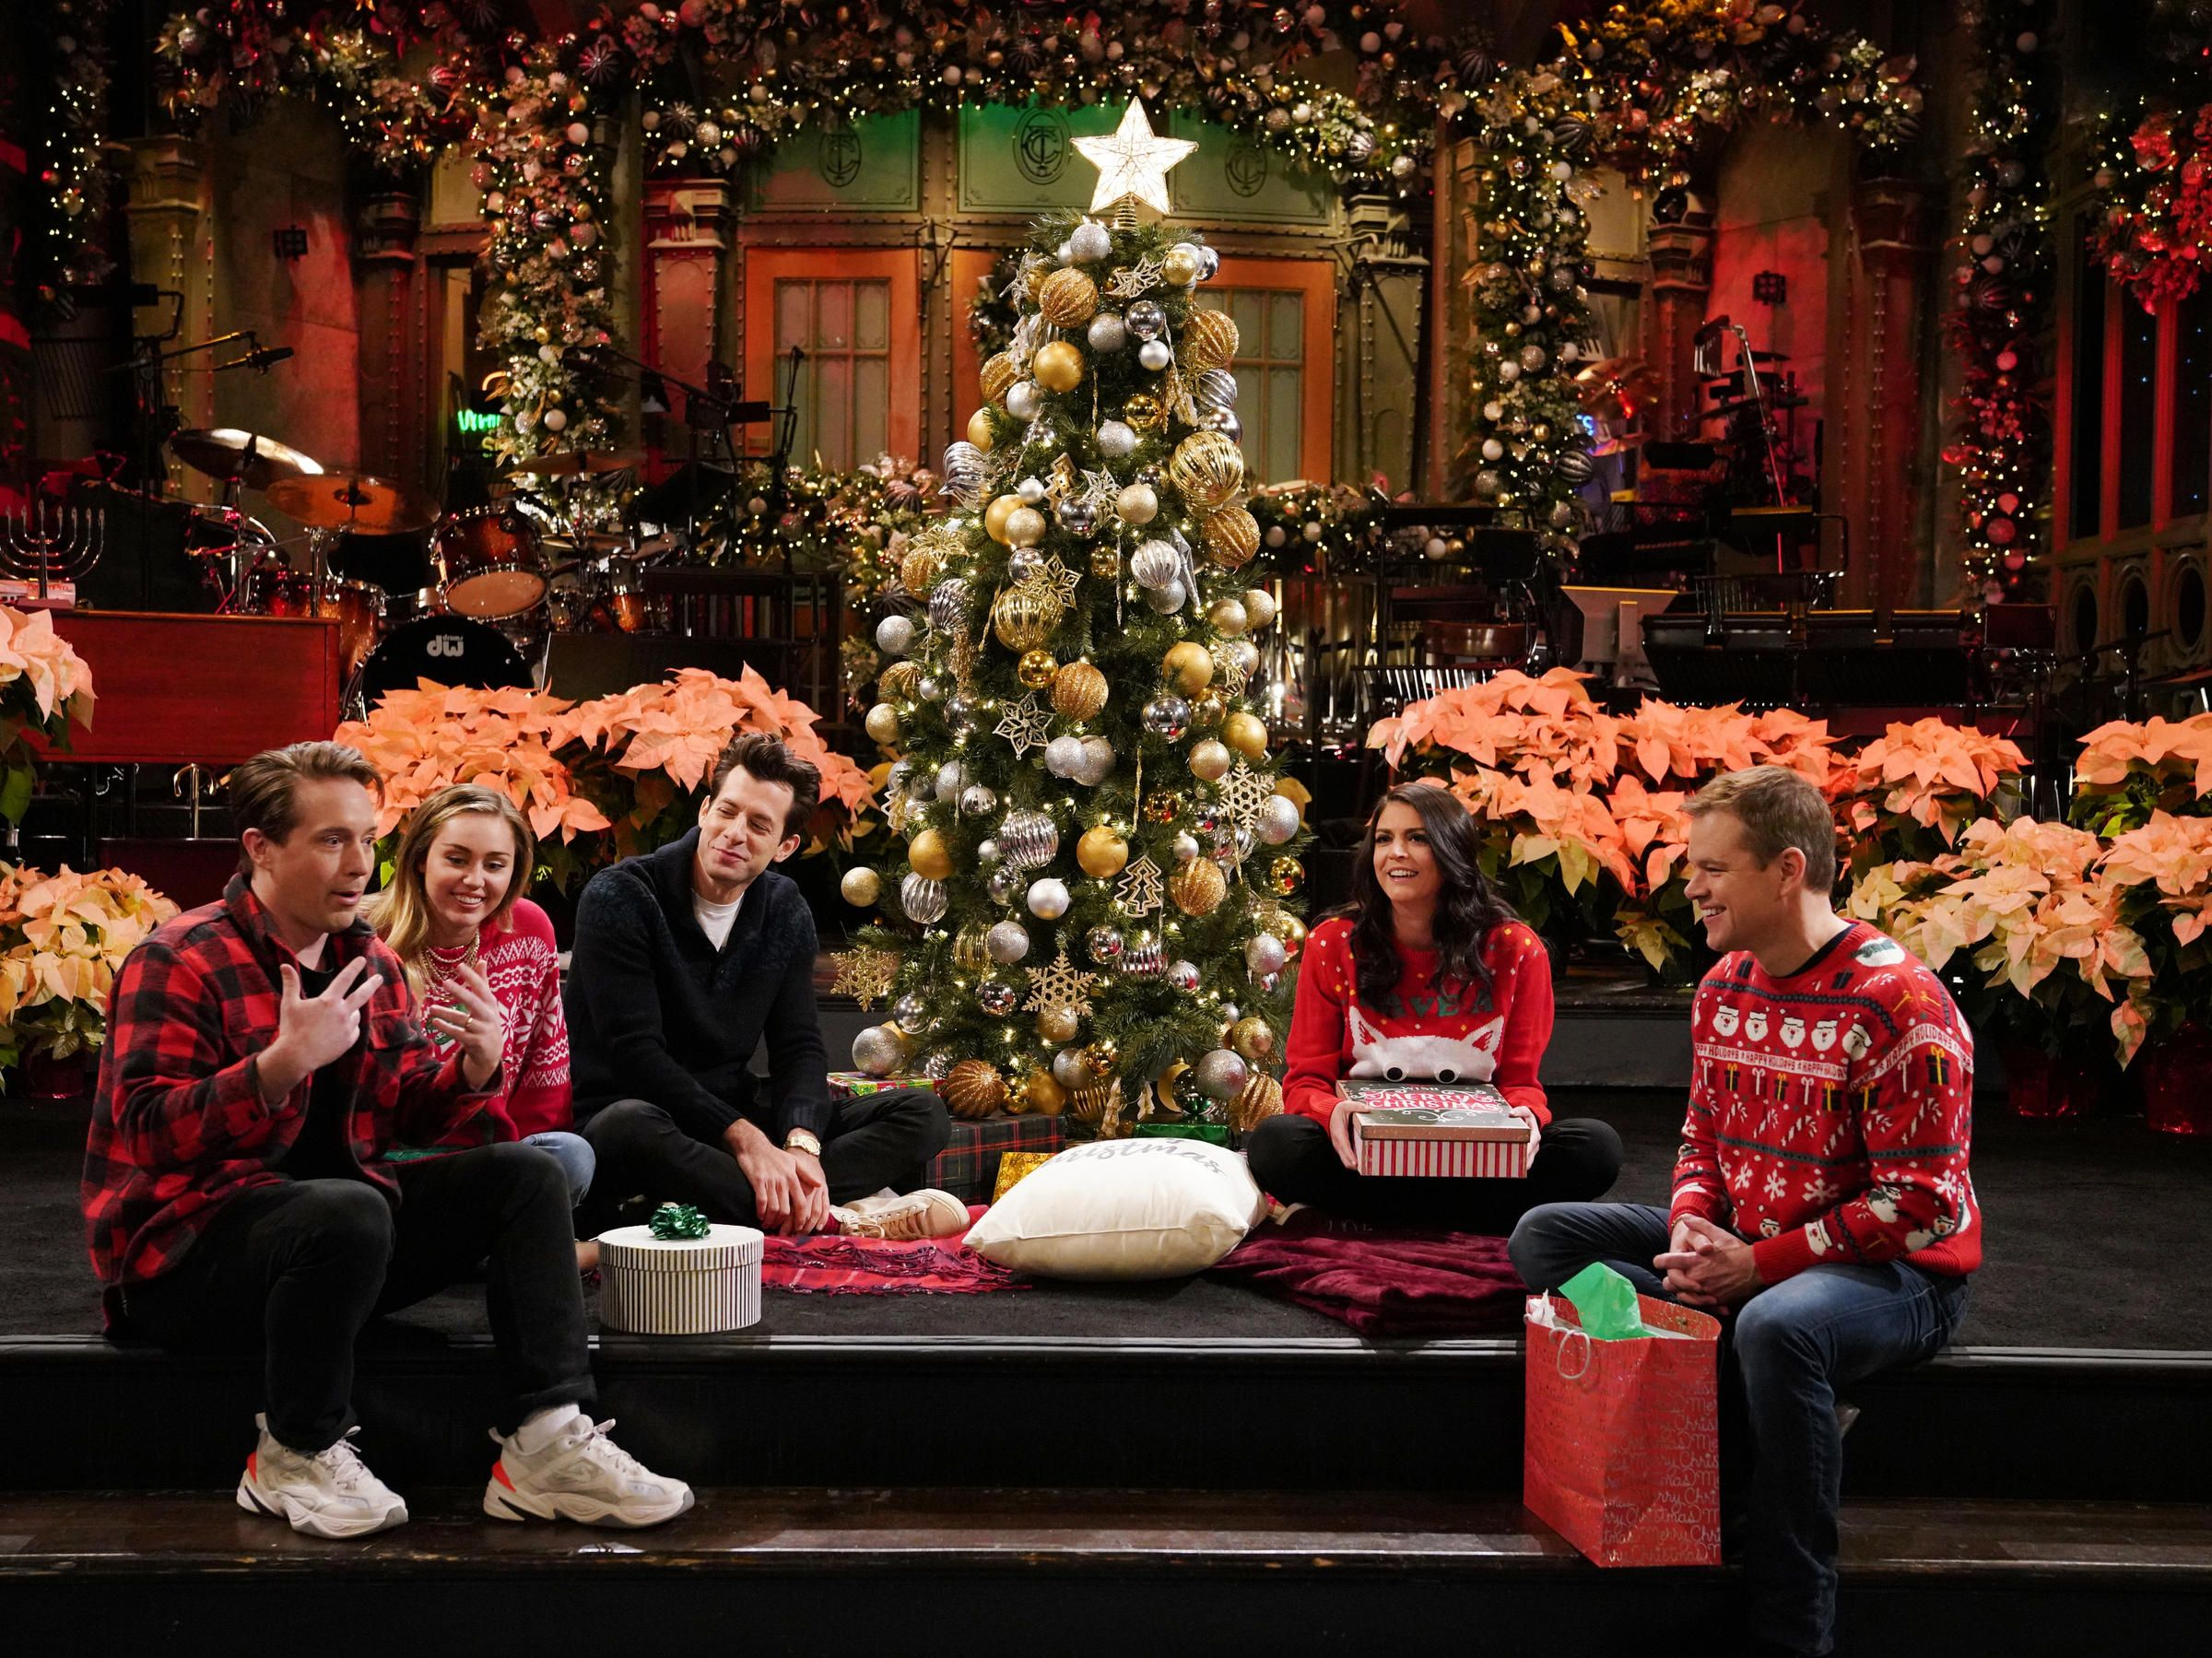 SNL main stage, 30 Rock Cool things to make, Secret